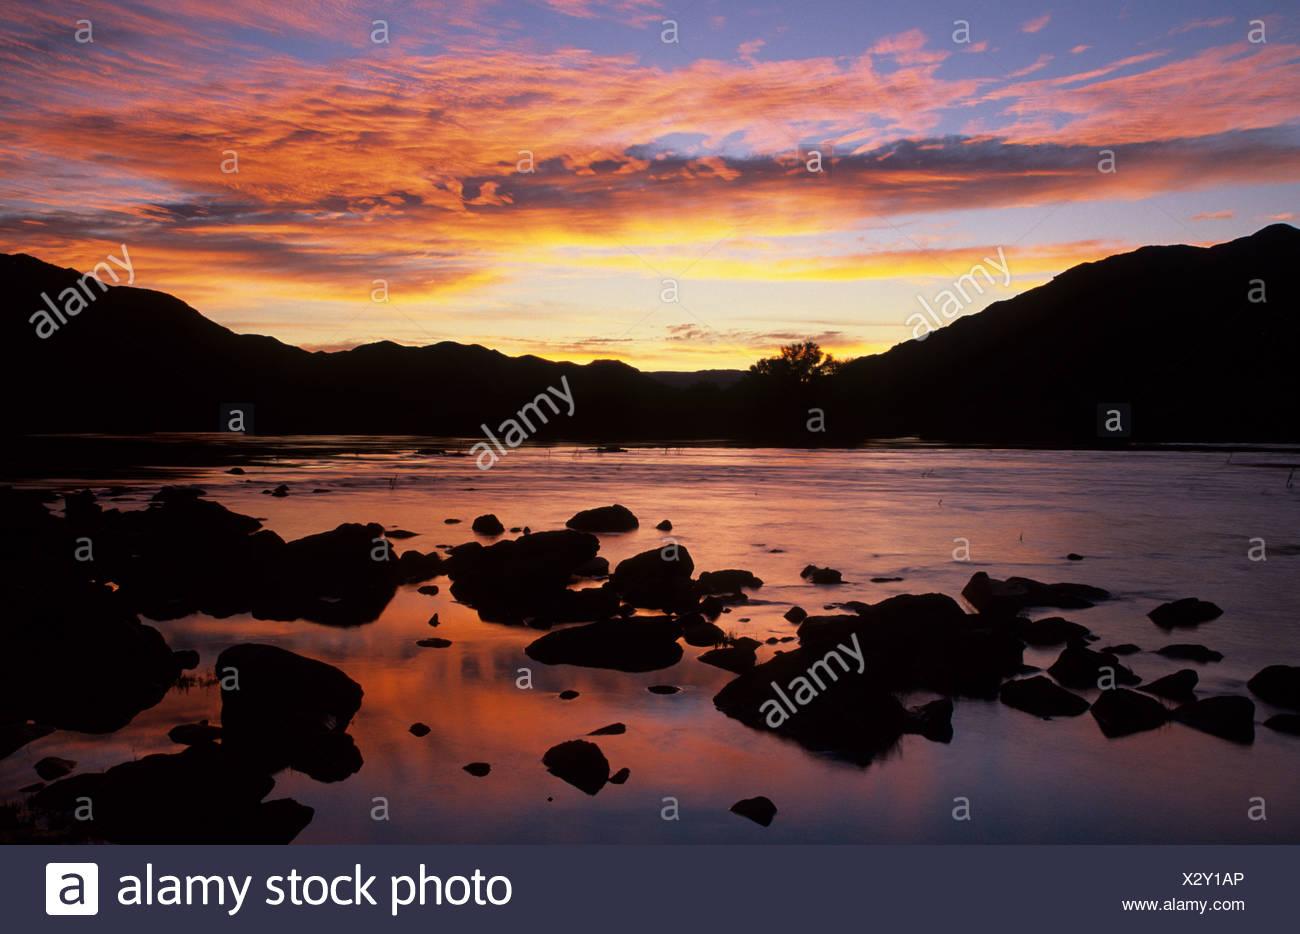 Orange River at sunset, Richtersveld National Park, Northern Cape, South Africa - Stock Image